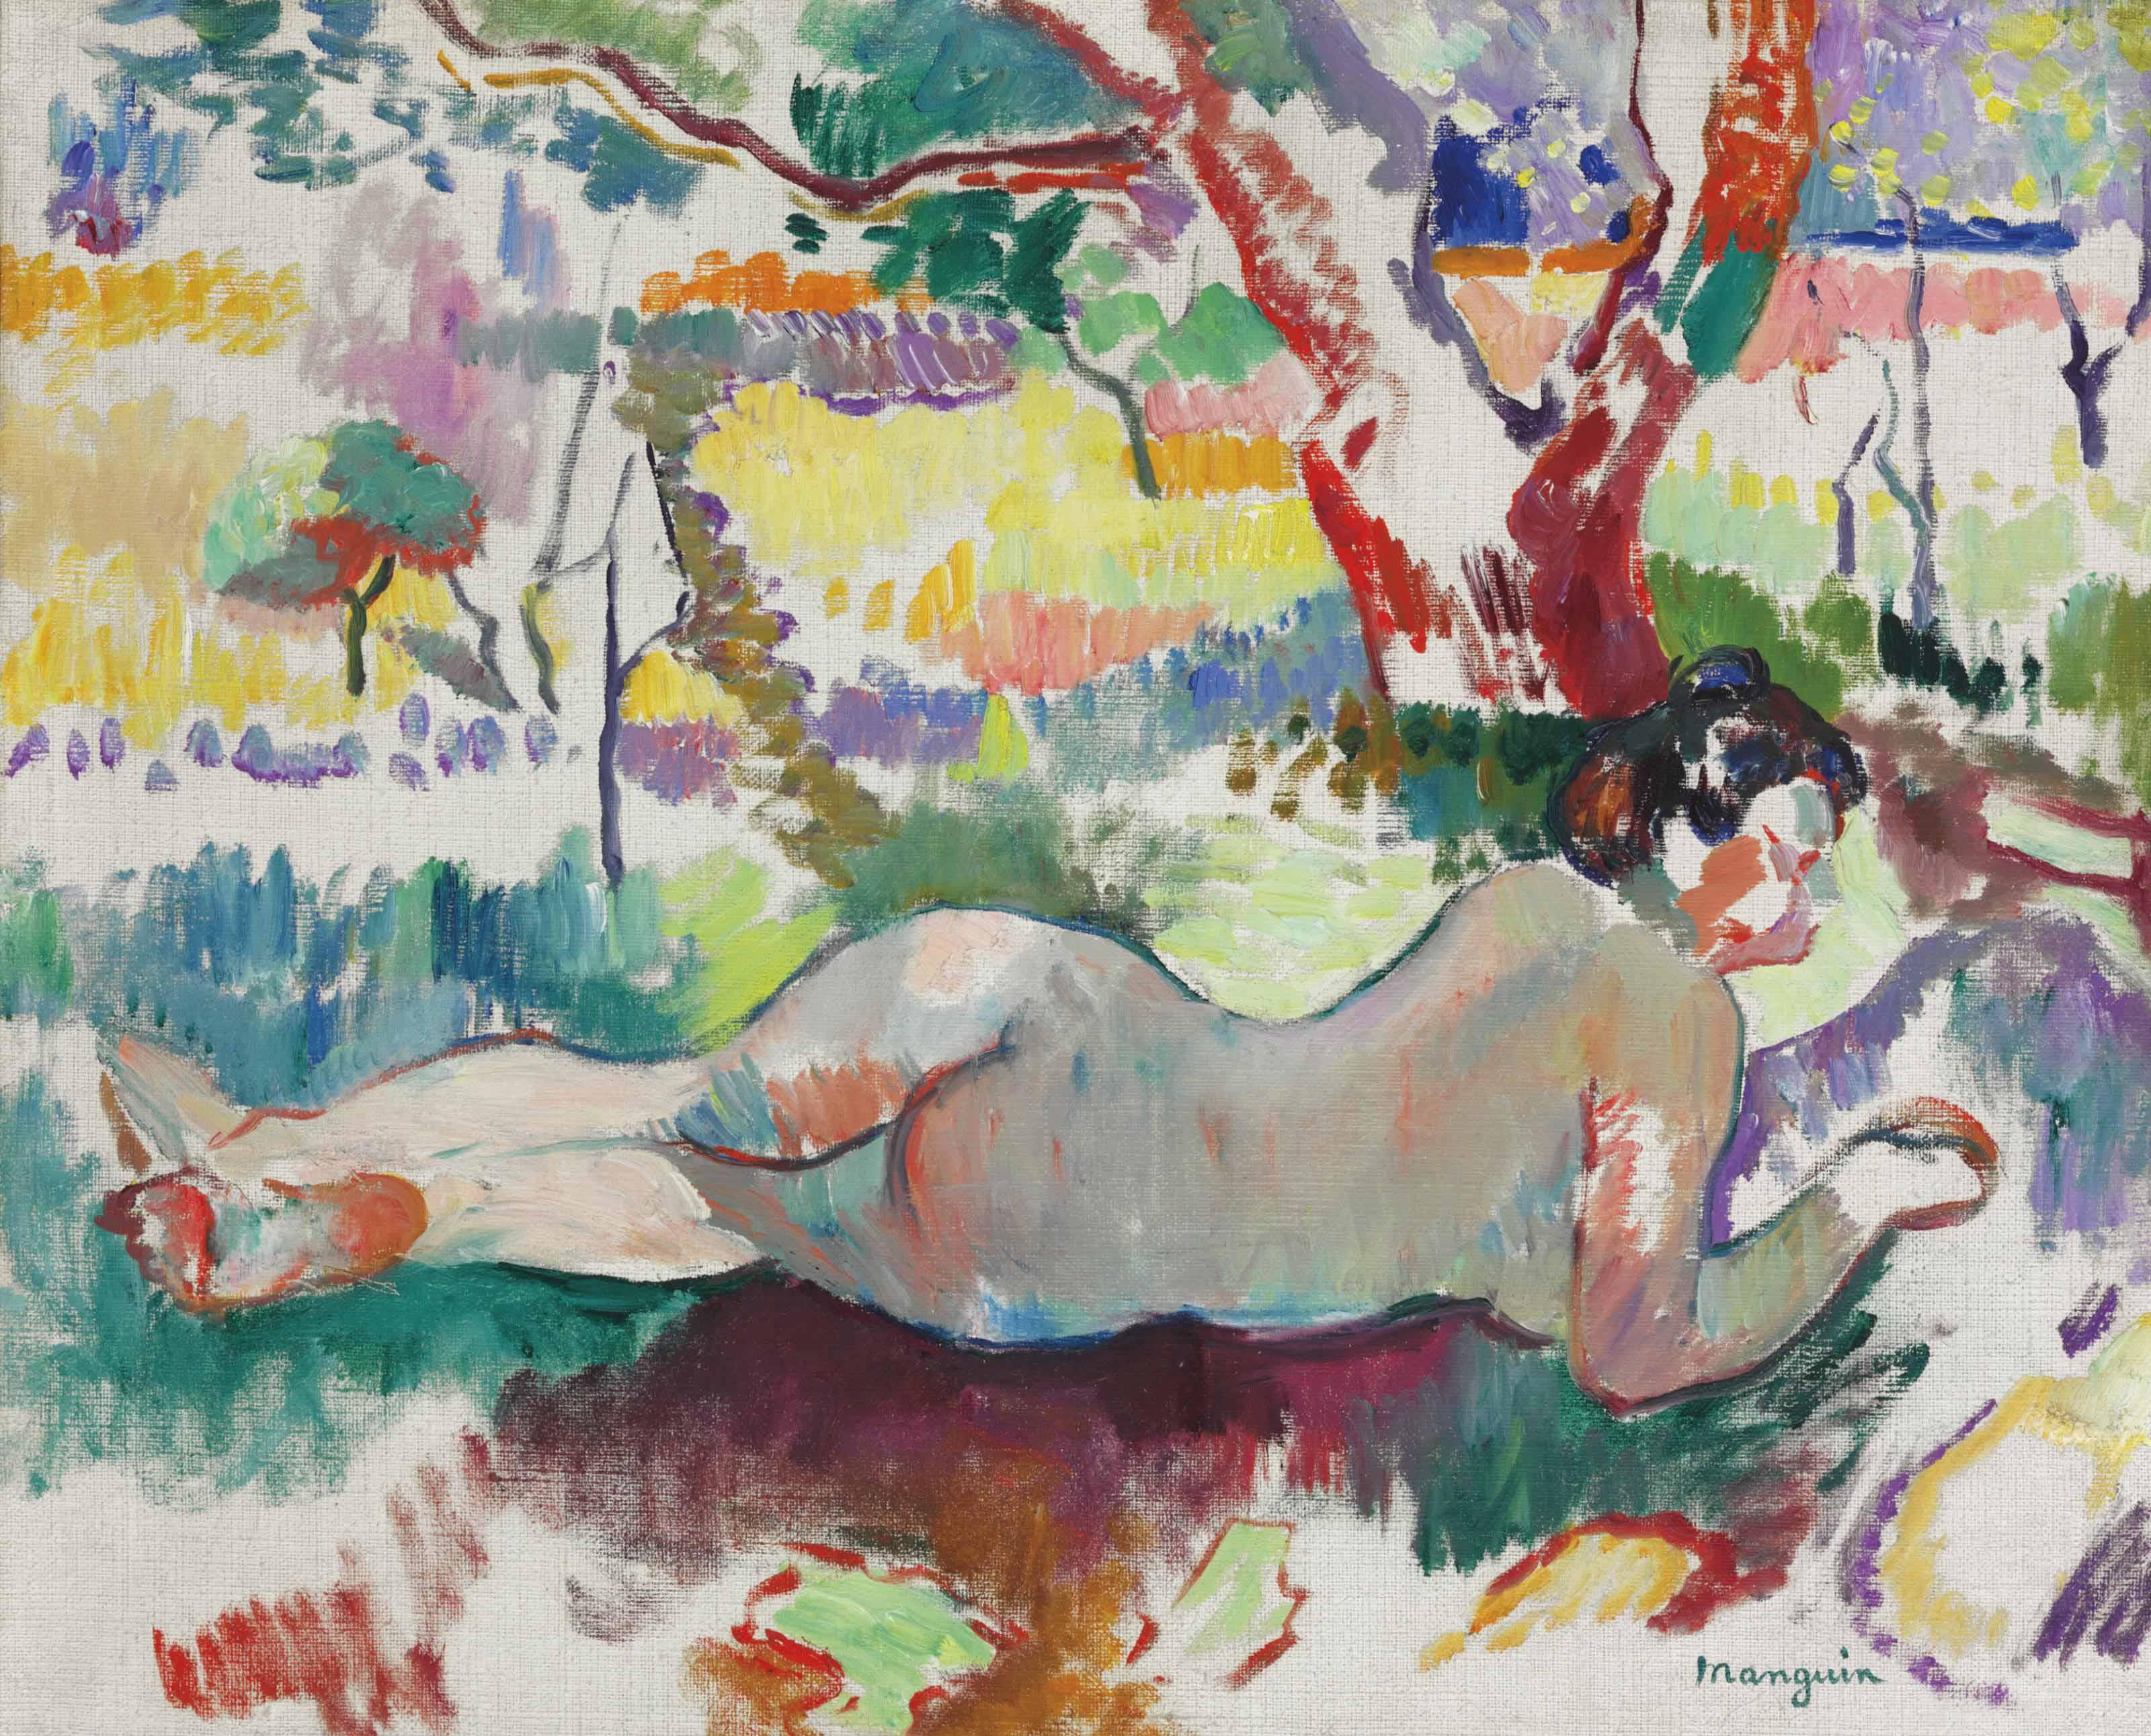 https://www.christies.com/img/LotImages/2013/NYR/2013_NYR_02784_0255_000(henri_manguin_etude_inversee_nu_sous_les_arbres_villa_demiere).jpg